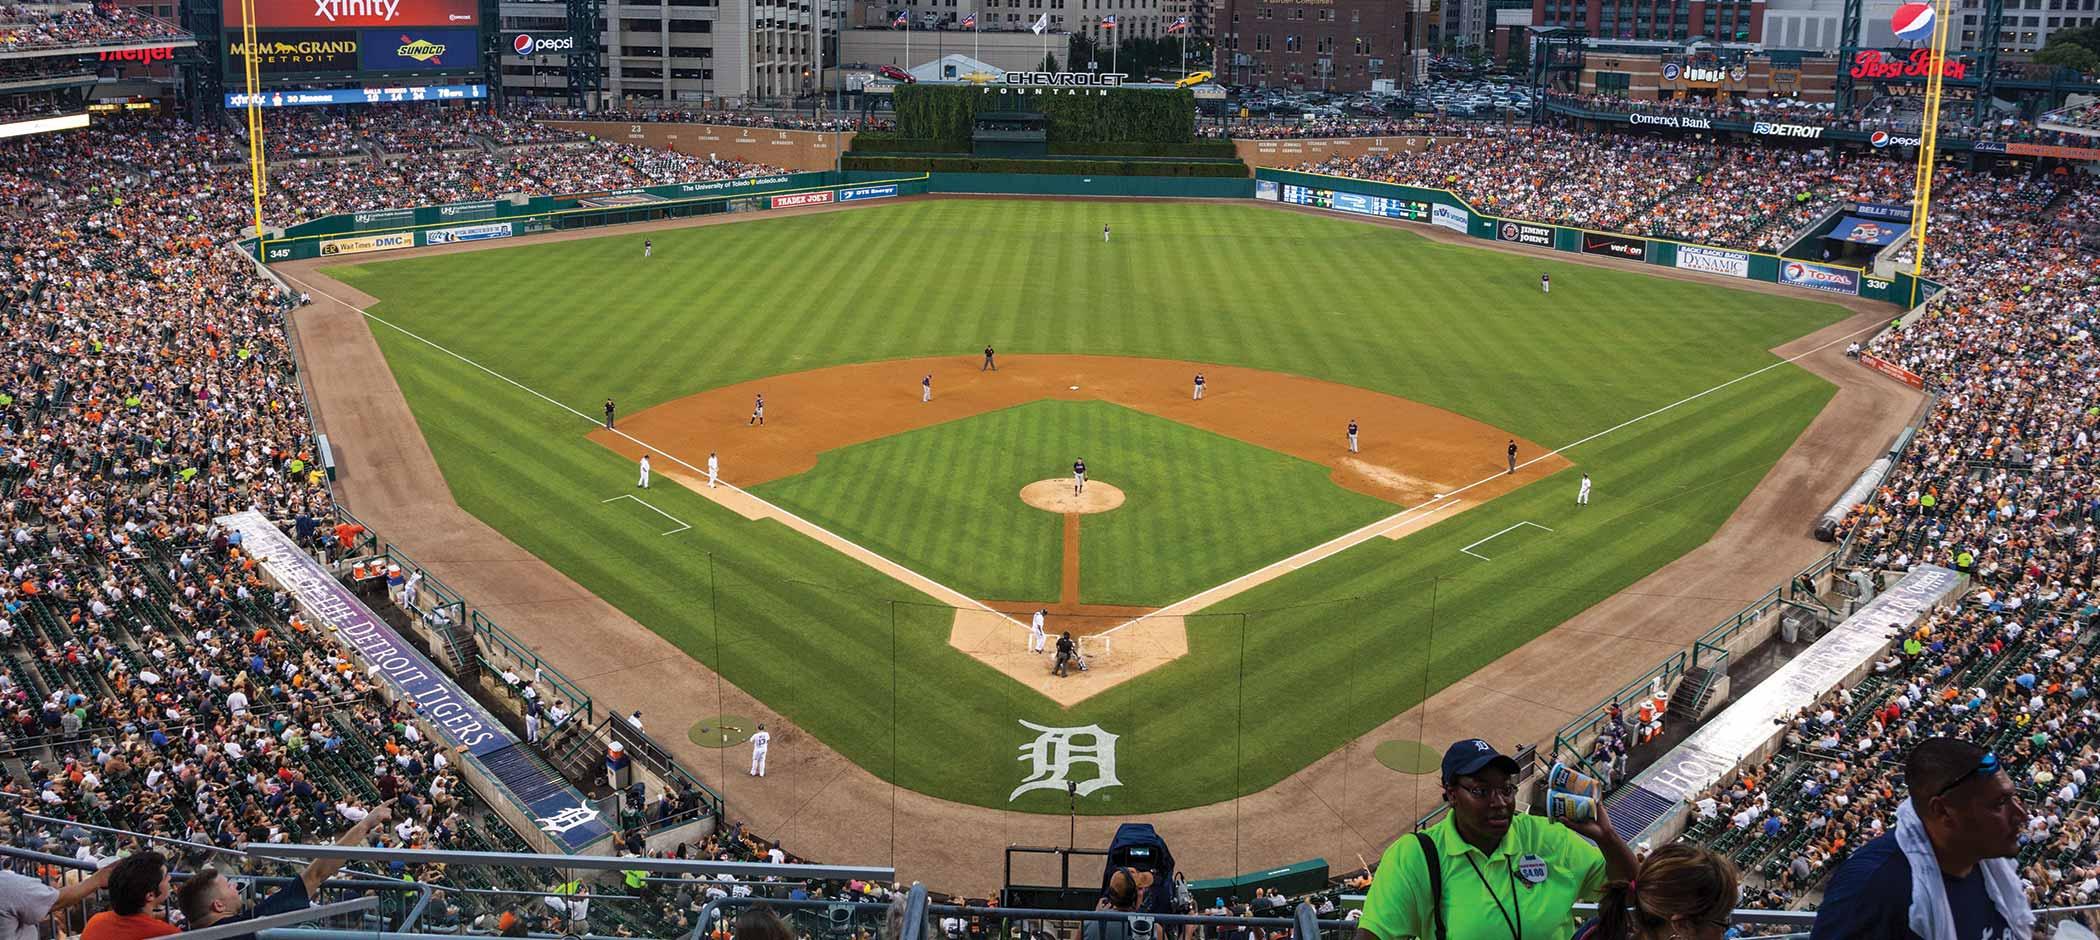 Comerica Park | Detroit Tigers Baseball Stadium ...